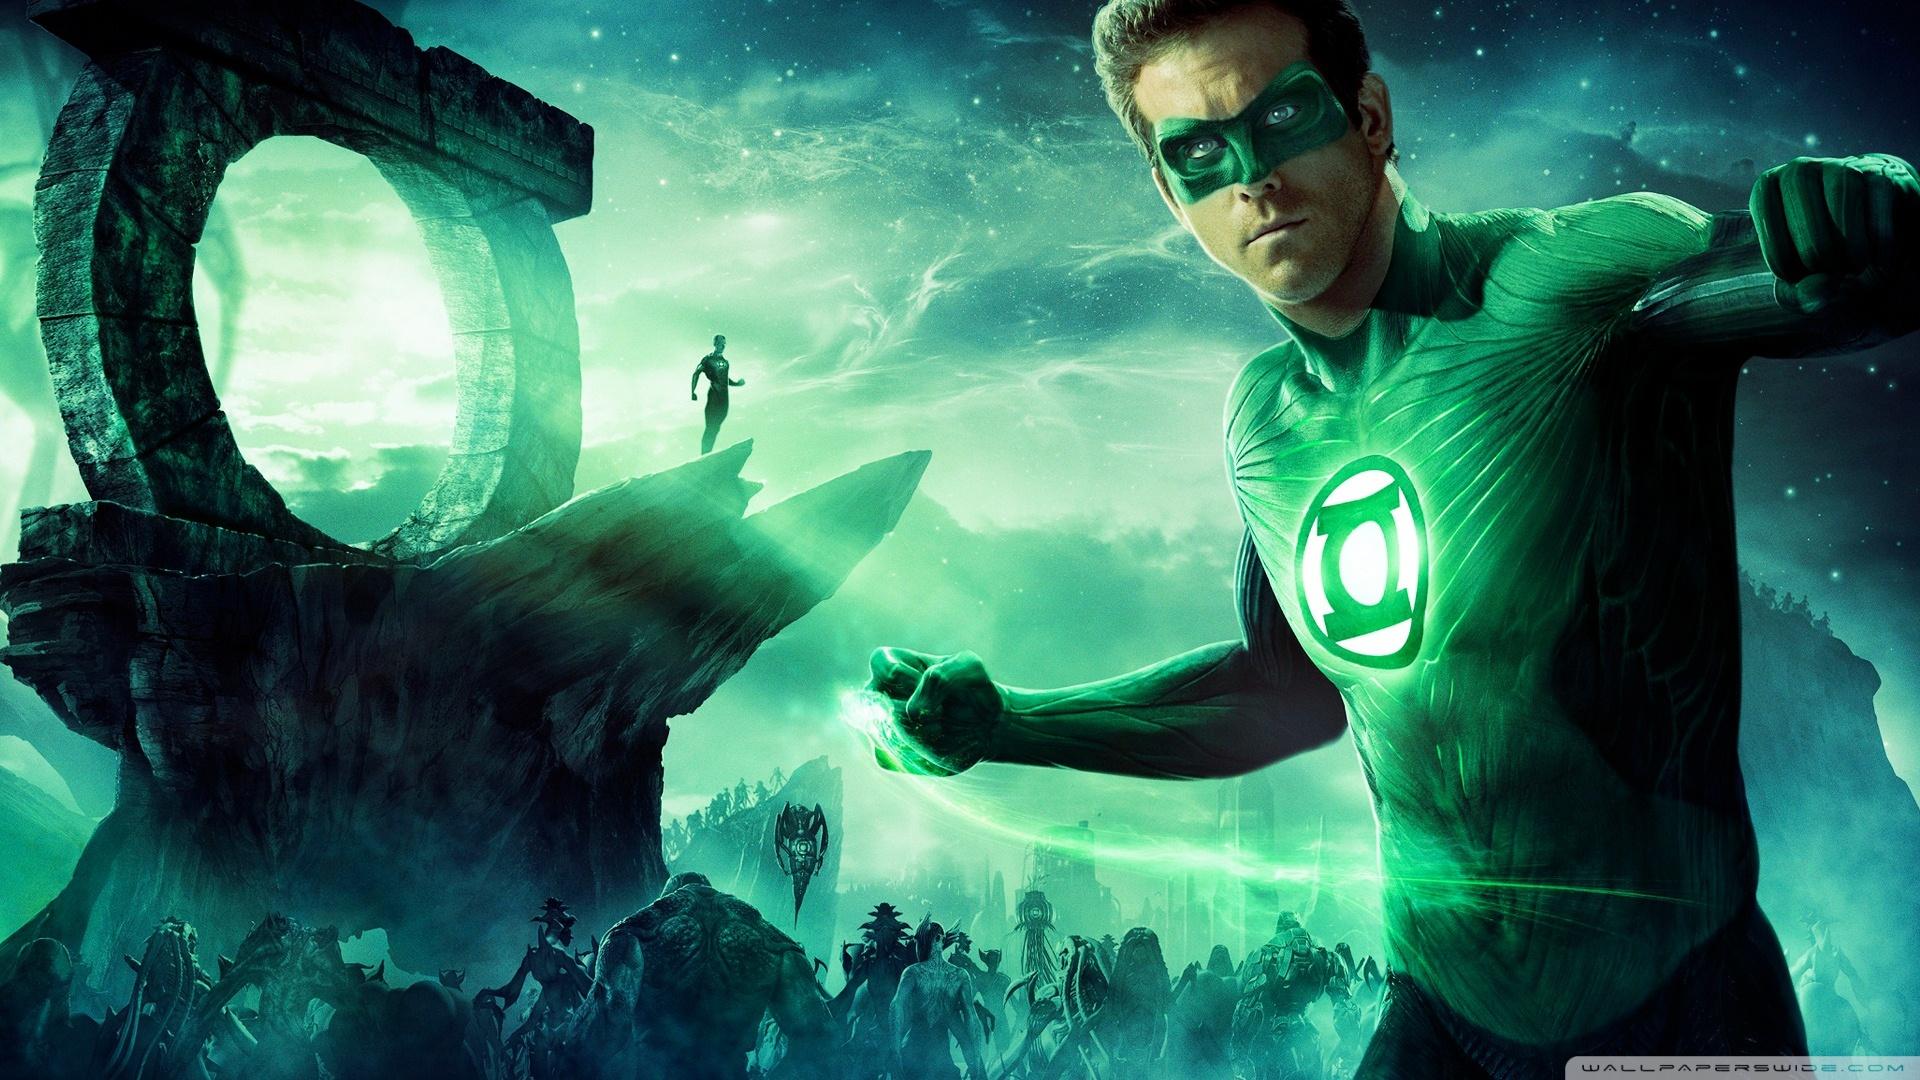 green_lantern_2011_movie-wallpaper-1920x1080.jpg